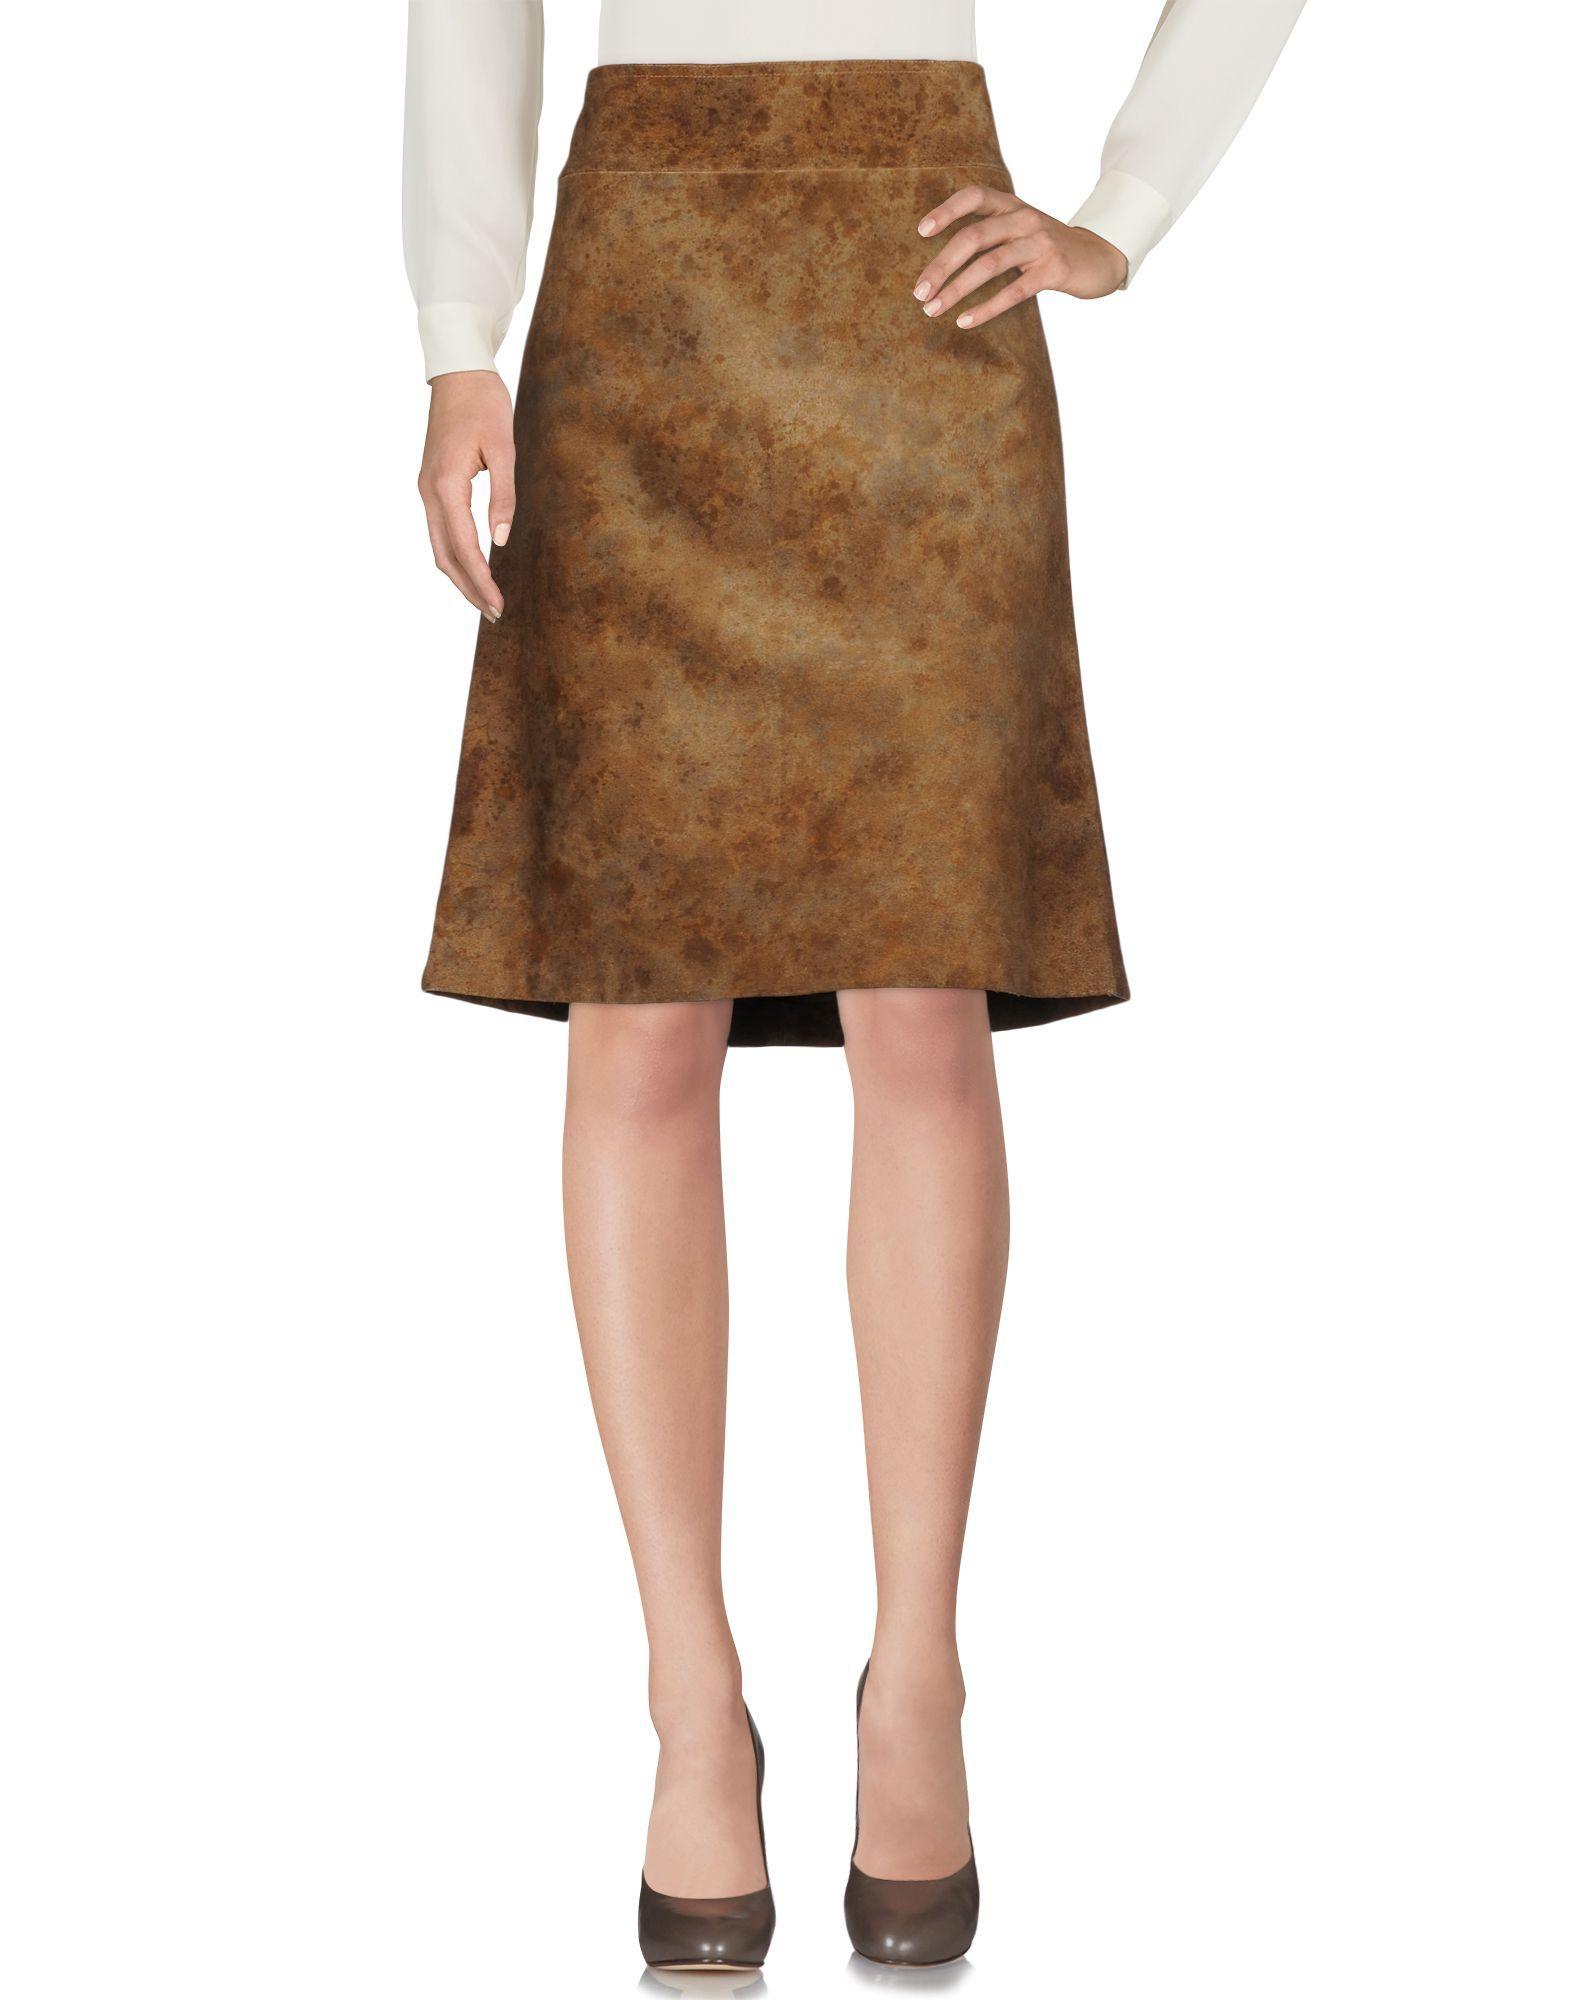 Costume National Khaki Leather Skirt